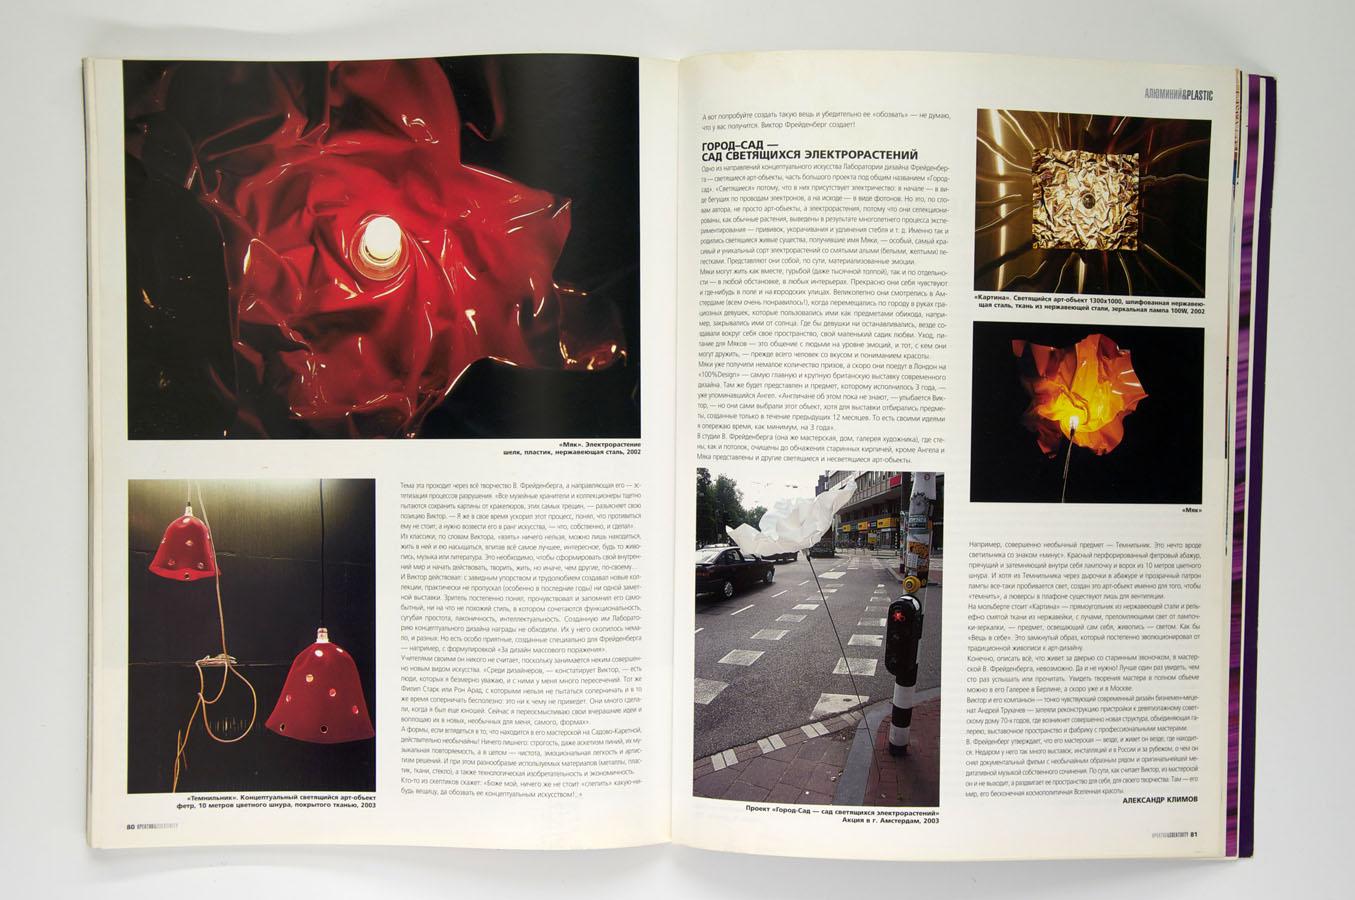 Freydenberg_Publication_98.jpg